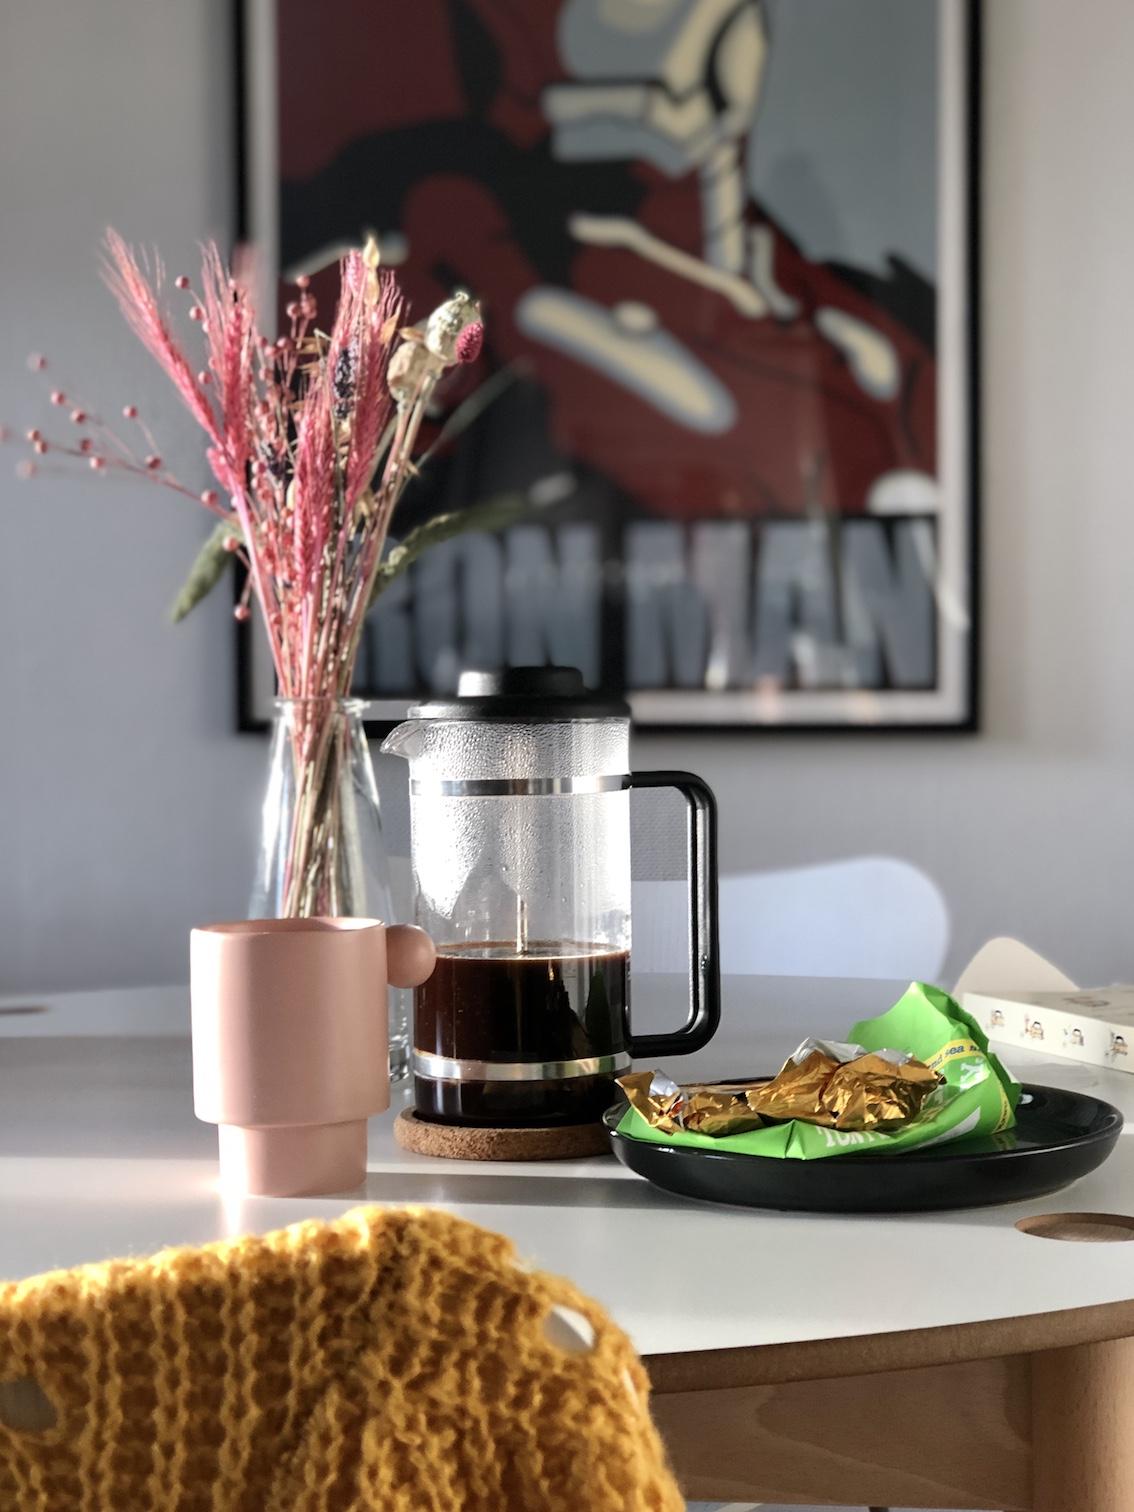 caffi kaffefiltre stempelkande kaffe urbannotes.dk